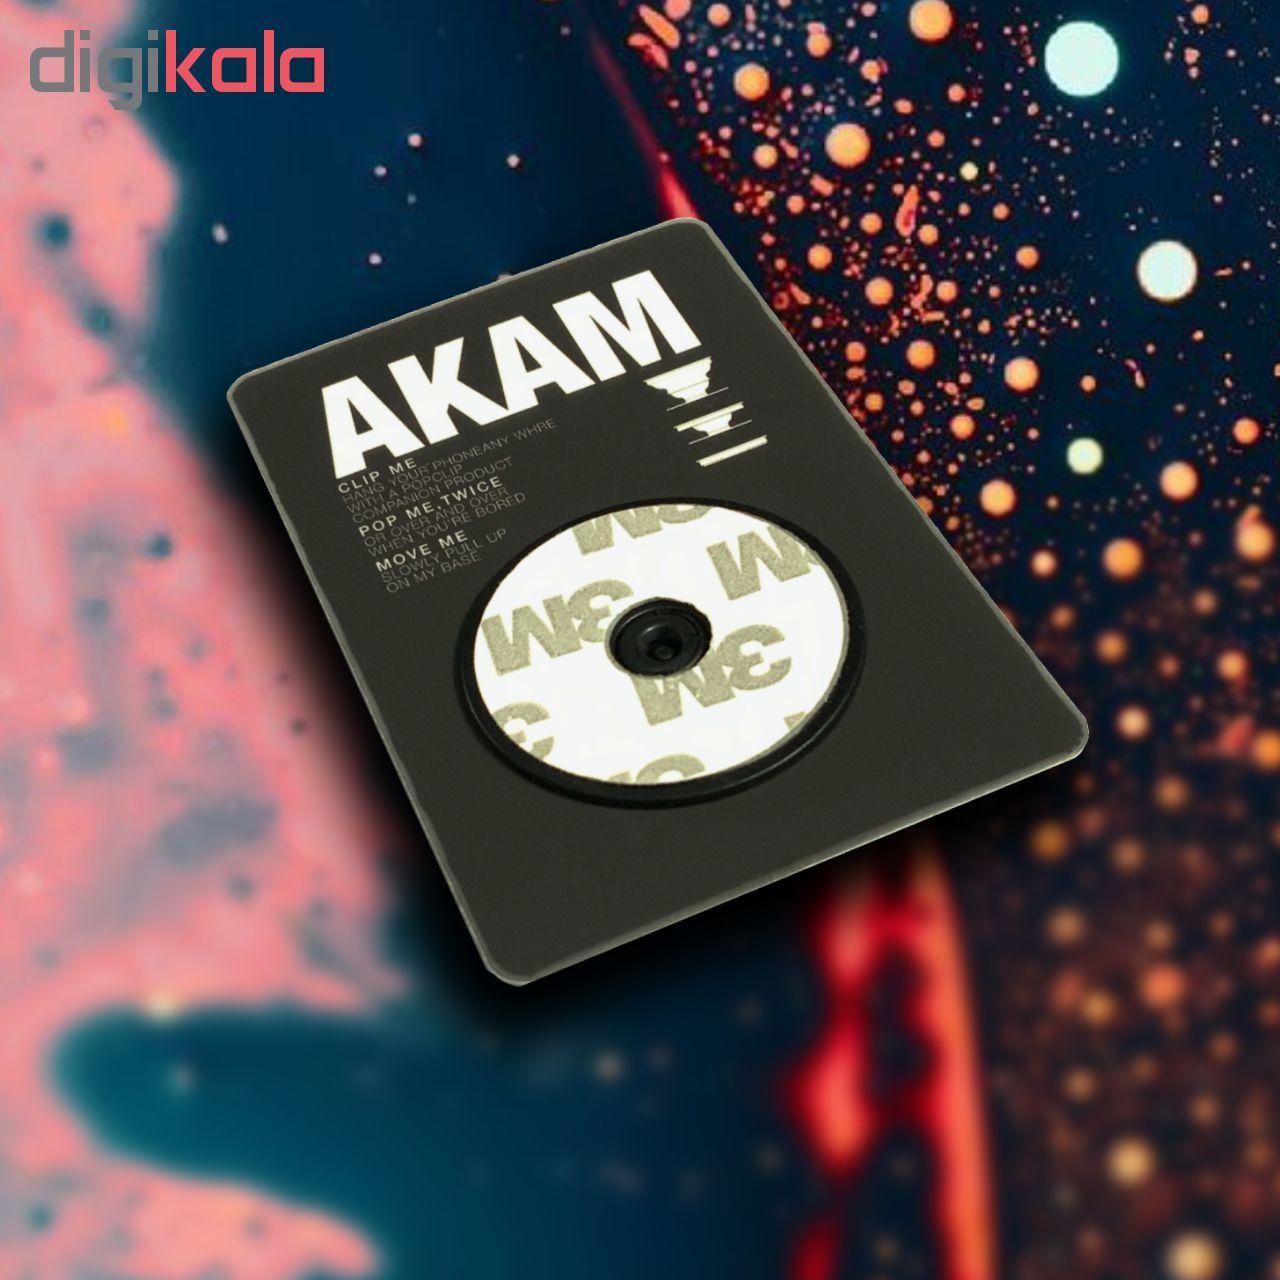 پایه نگهدارنده گوشی موبایل پاپ سوکت آکام مدل APS0033 main 1 2